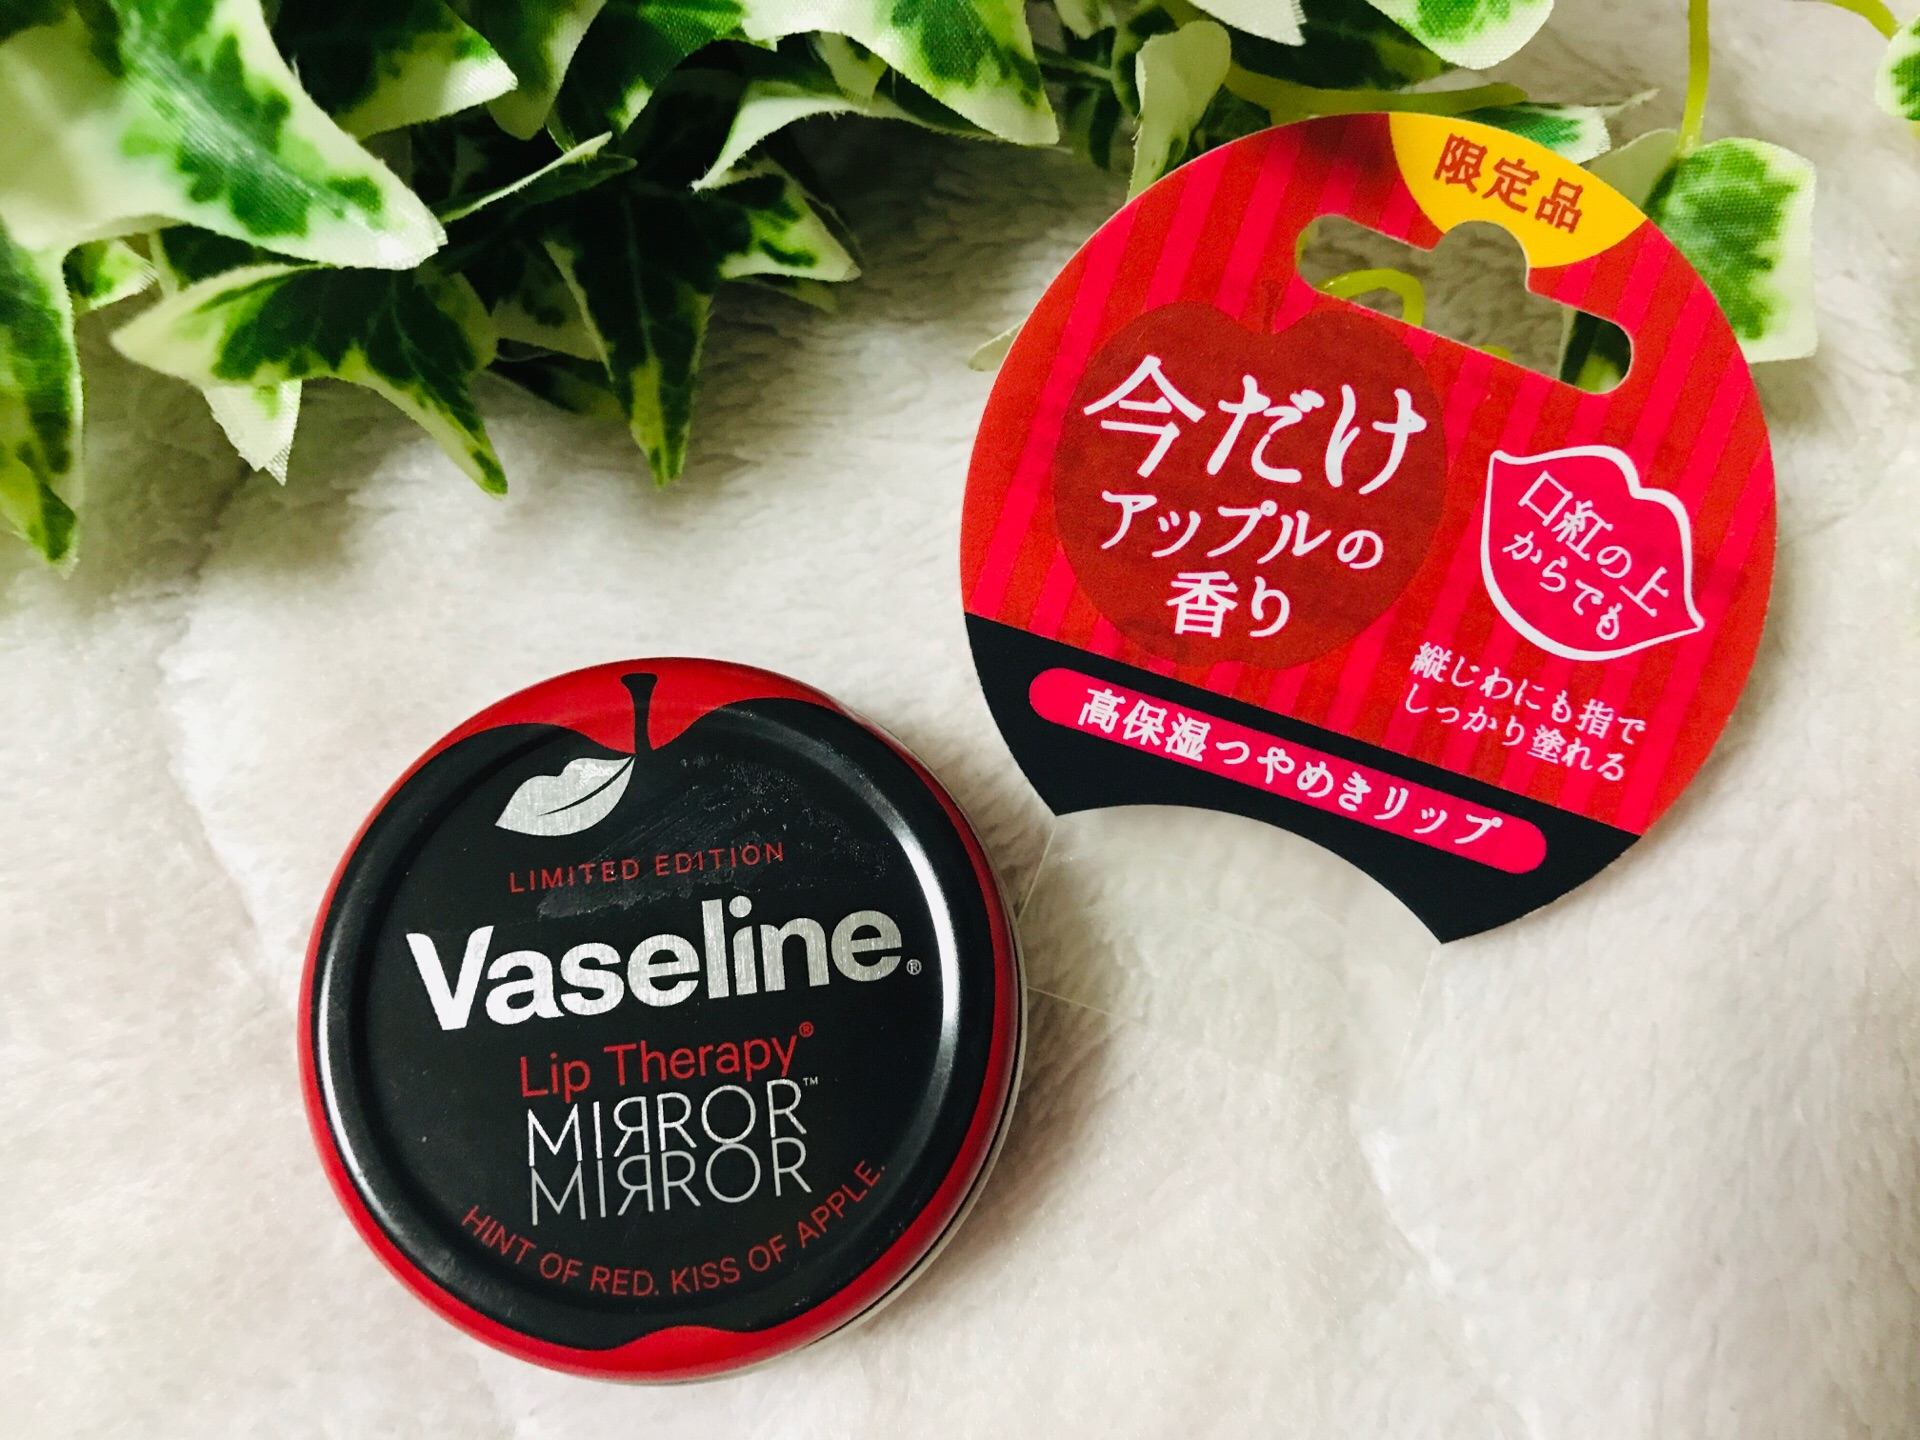 【Vaseline】2018年限定!保湿力を誇る大人気リップから《アップルの香り》が限定販売中♡_1